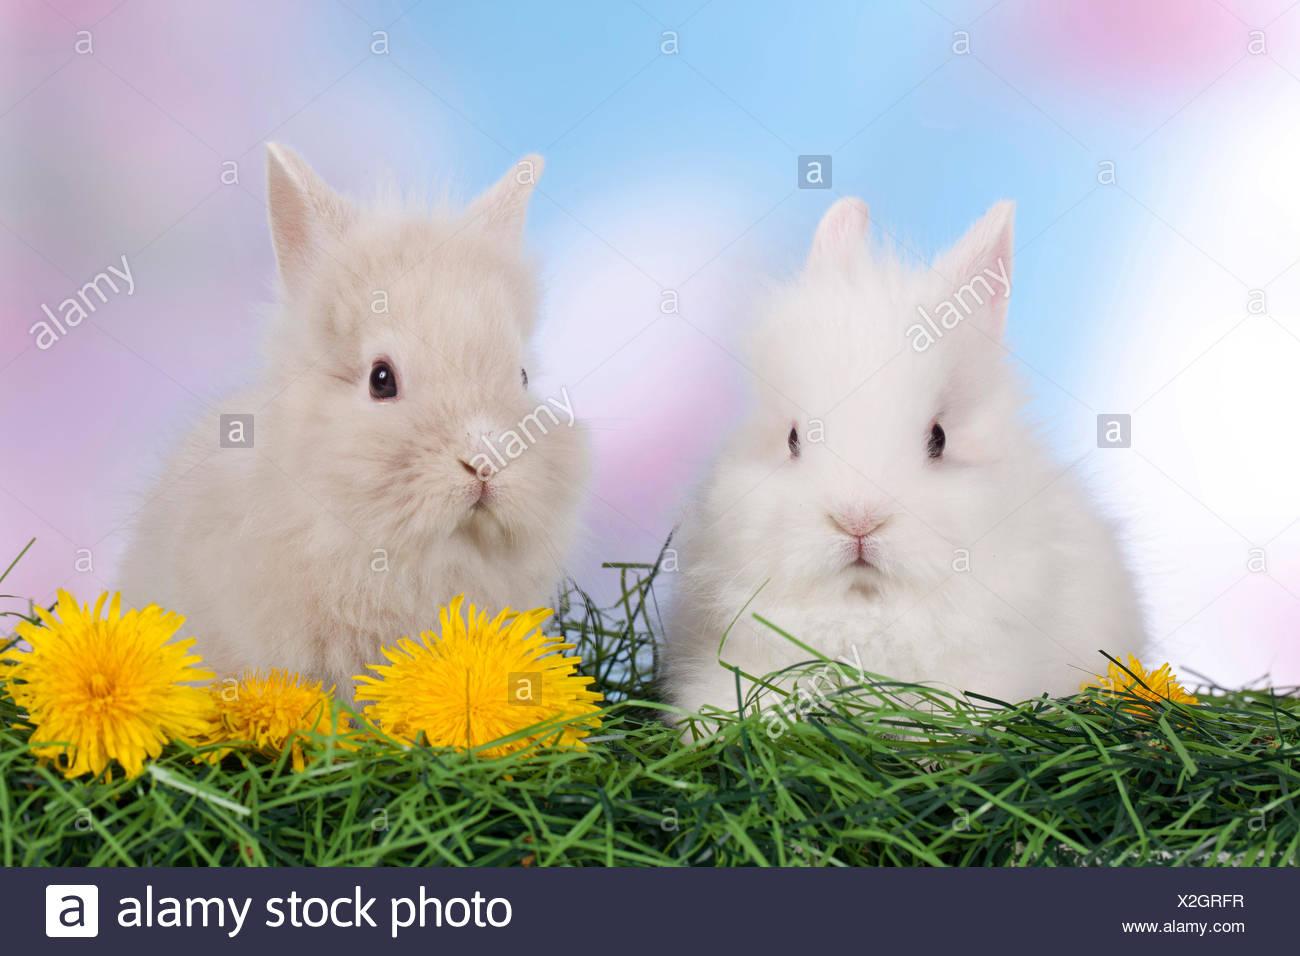 Dwarf Rabbit, Lionhead Rabbit Two individuals grass Dandelion flowers - Stock Image